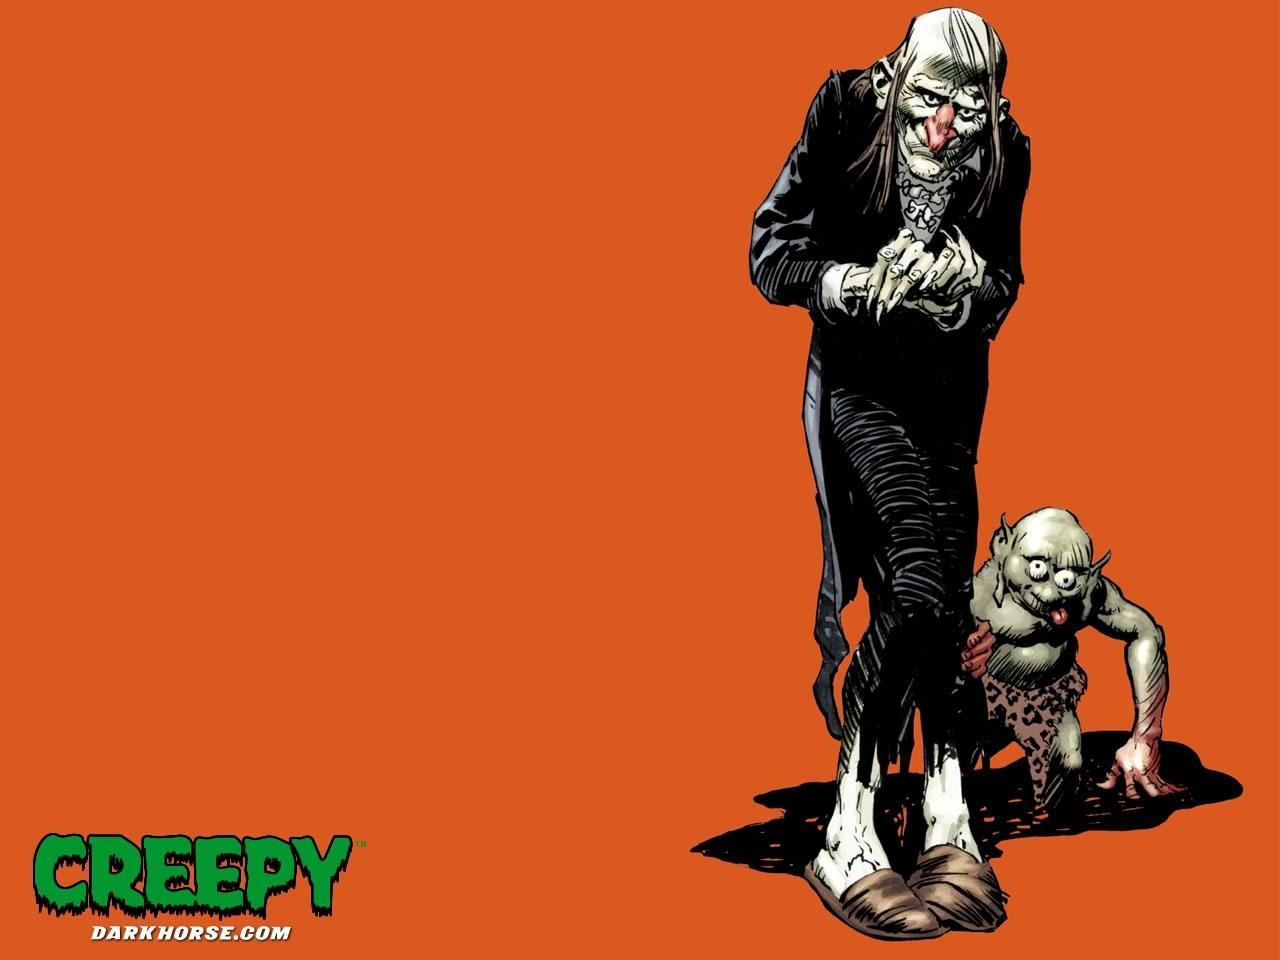 Creepy Comics wallpapers HD quality